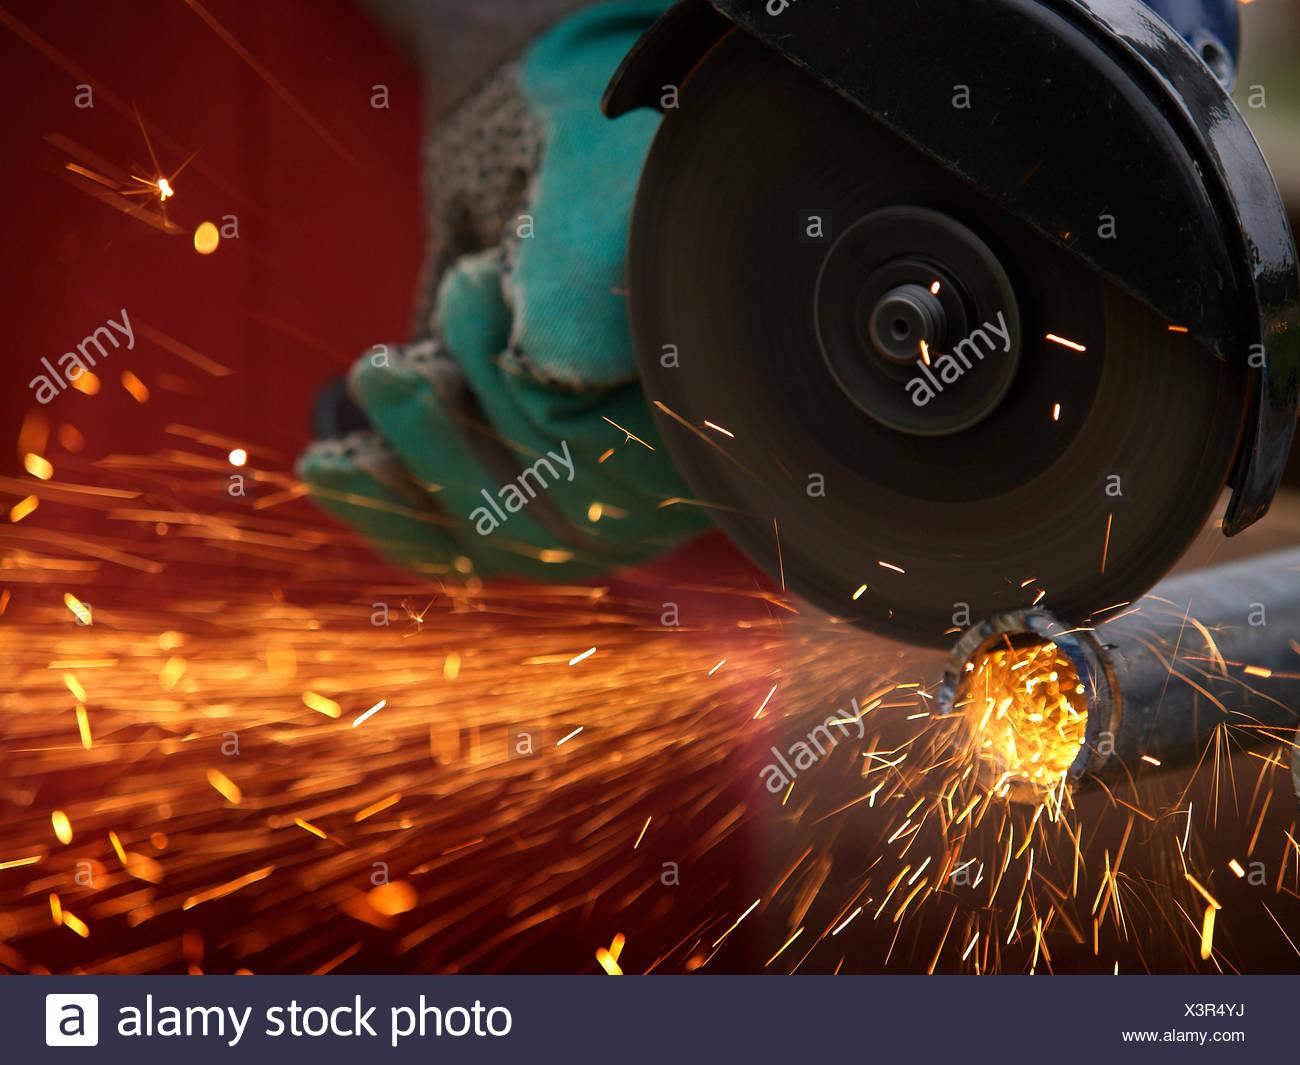 flying sparks,angle grinders,angle grinder - Stock Image